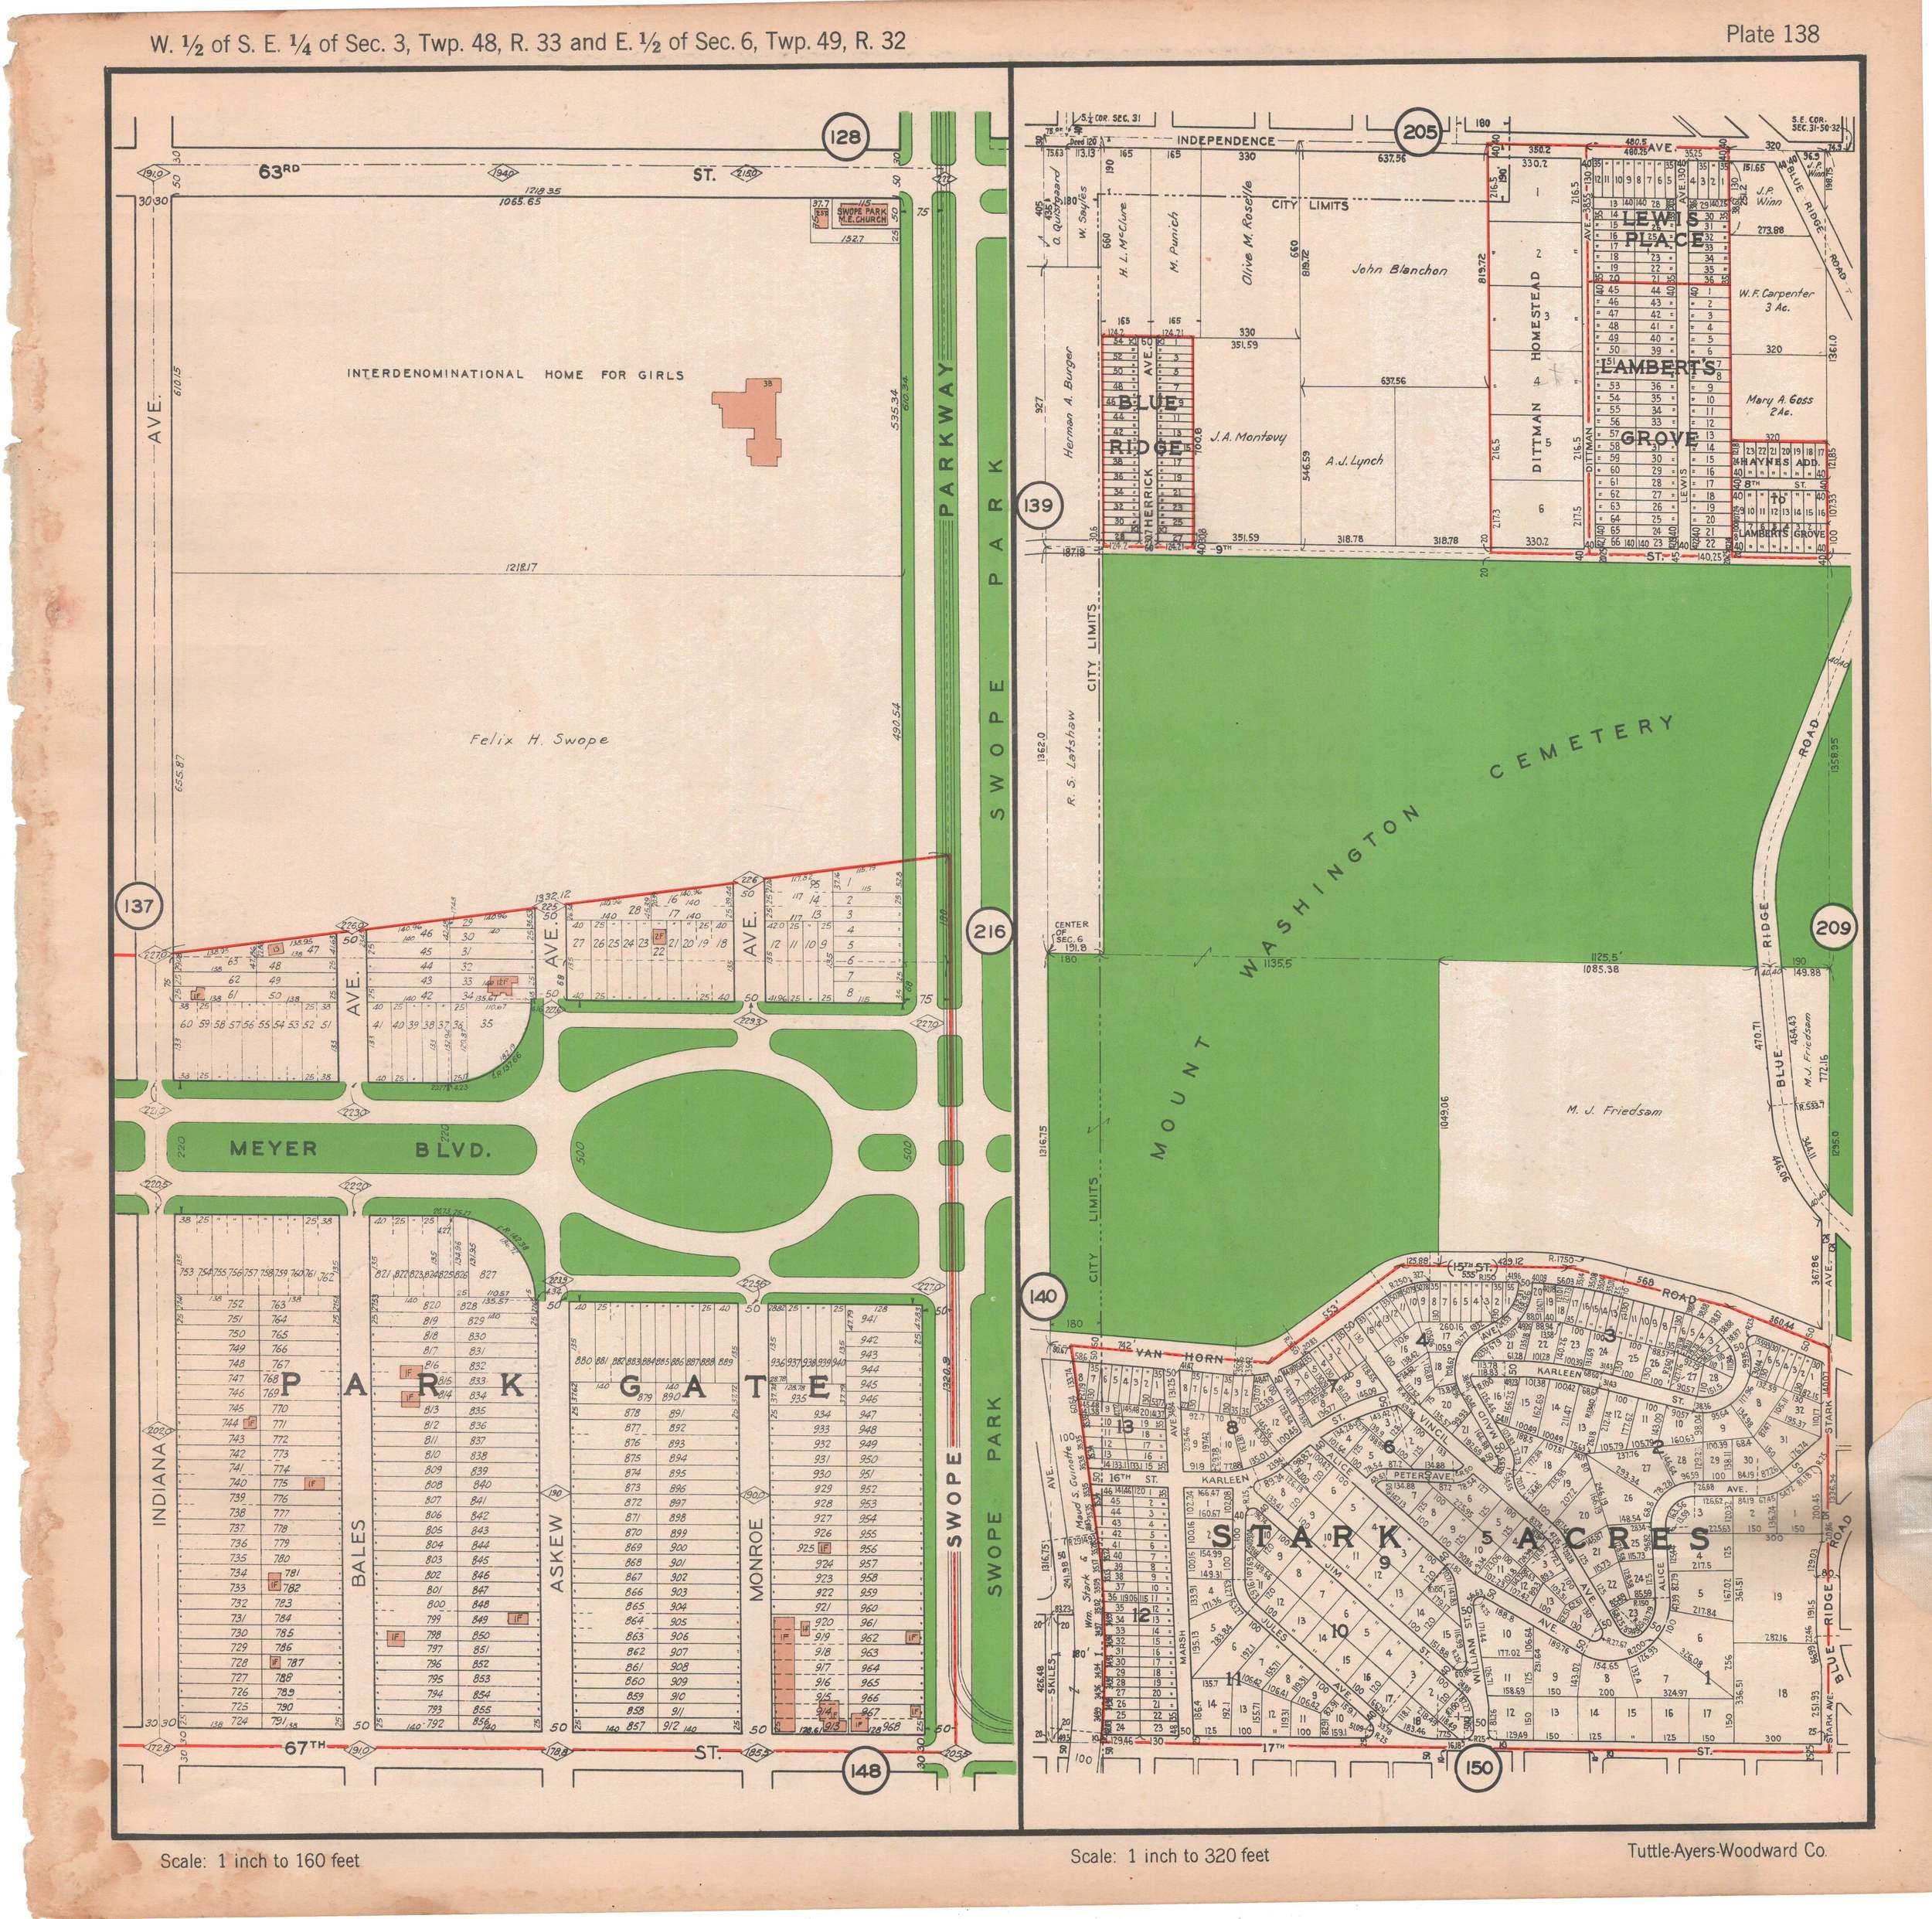 1925 TUTTLE_AYERS_Plate_138.JPG